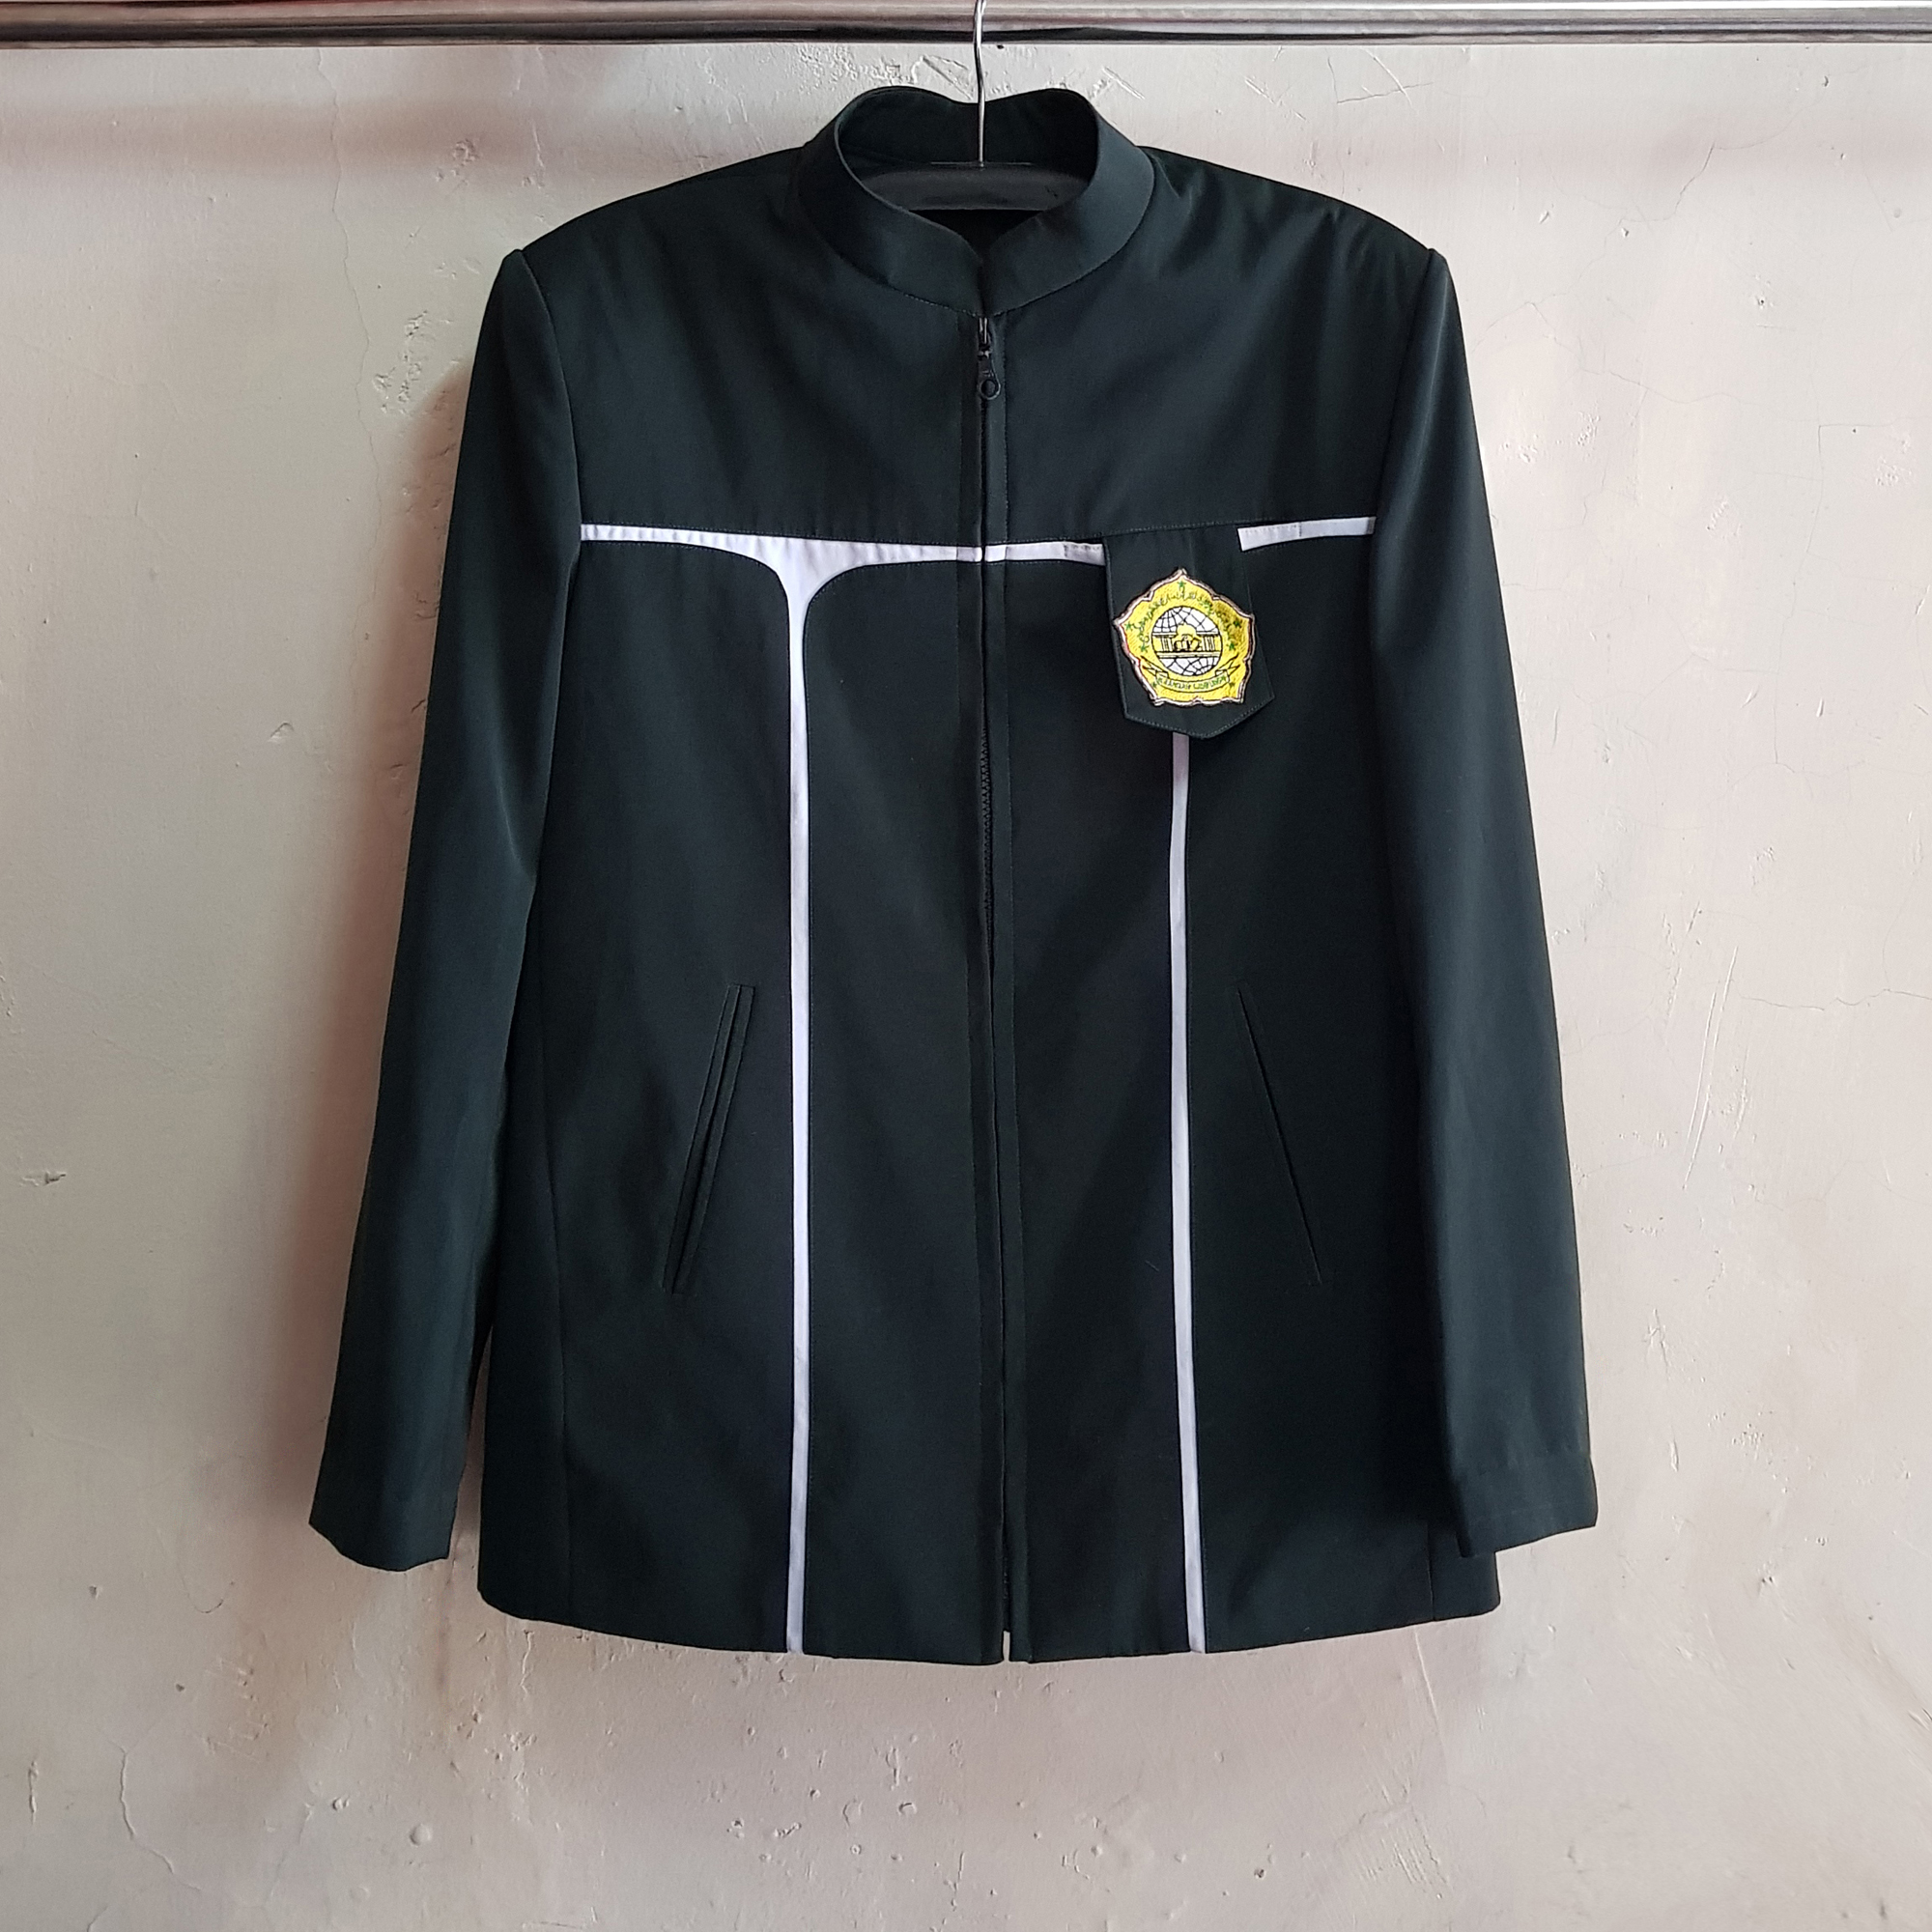 Seragam Jaket Ponpes, Jaket Kelas MU